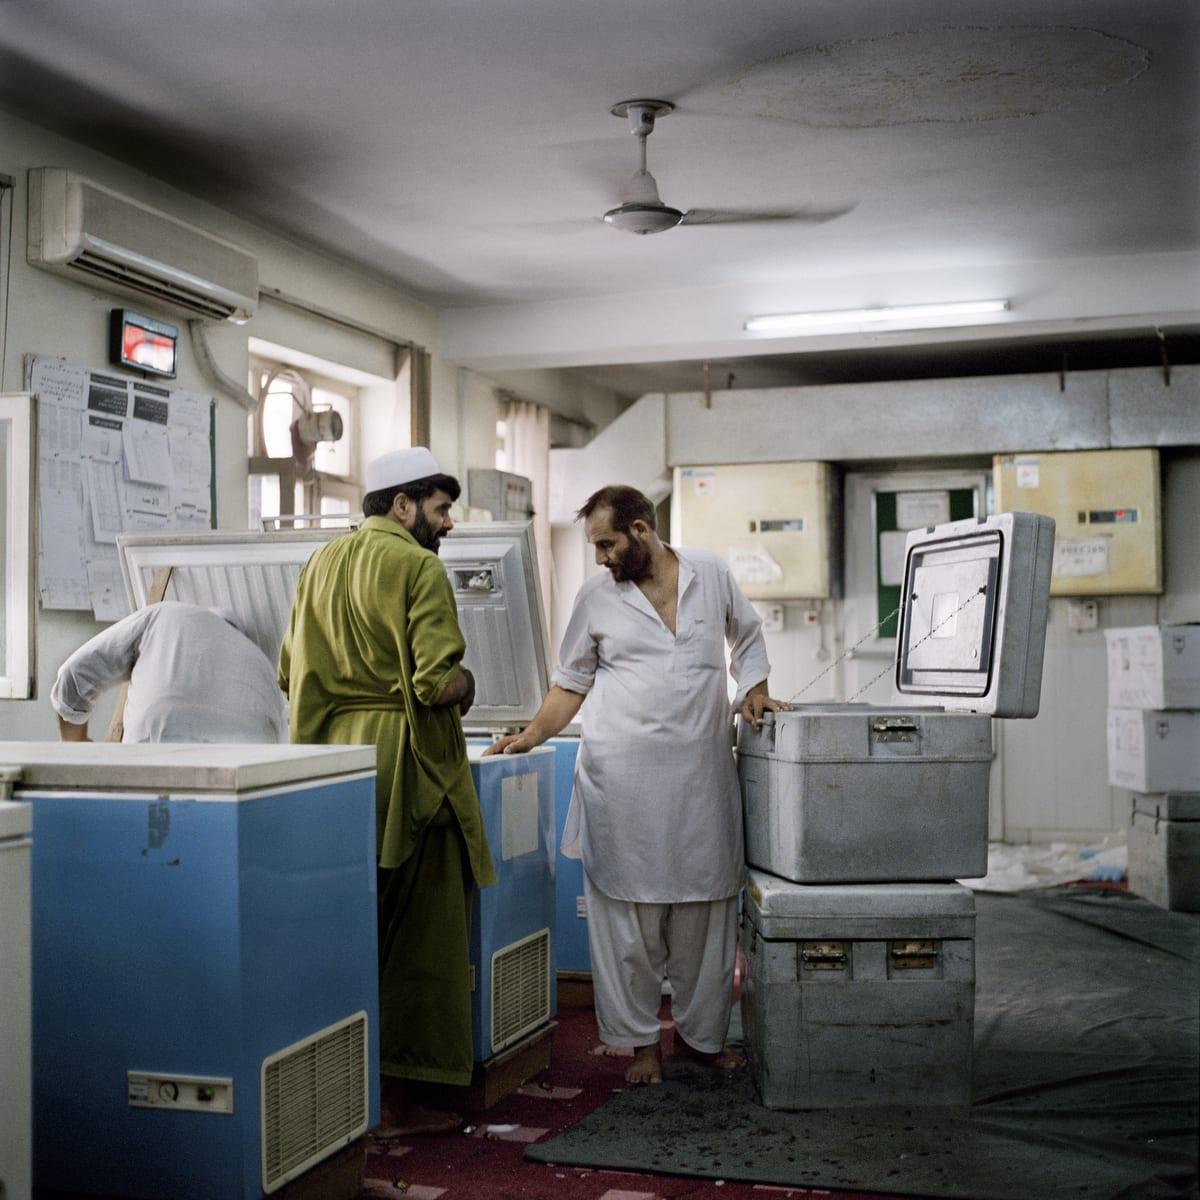 british-journal-photography-anastasia-taylor-lind